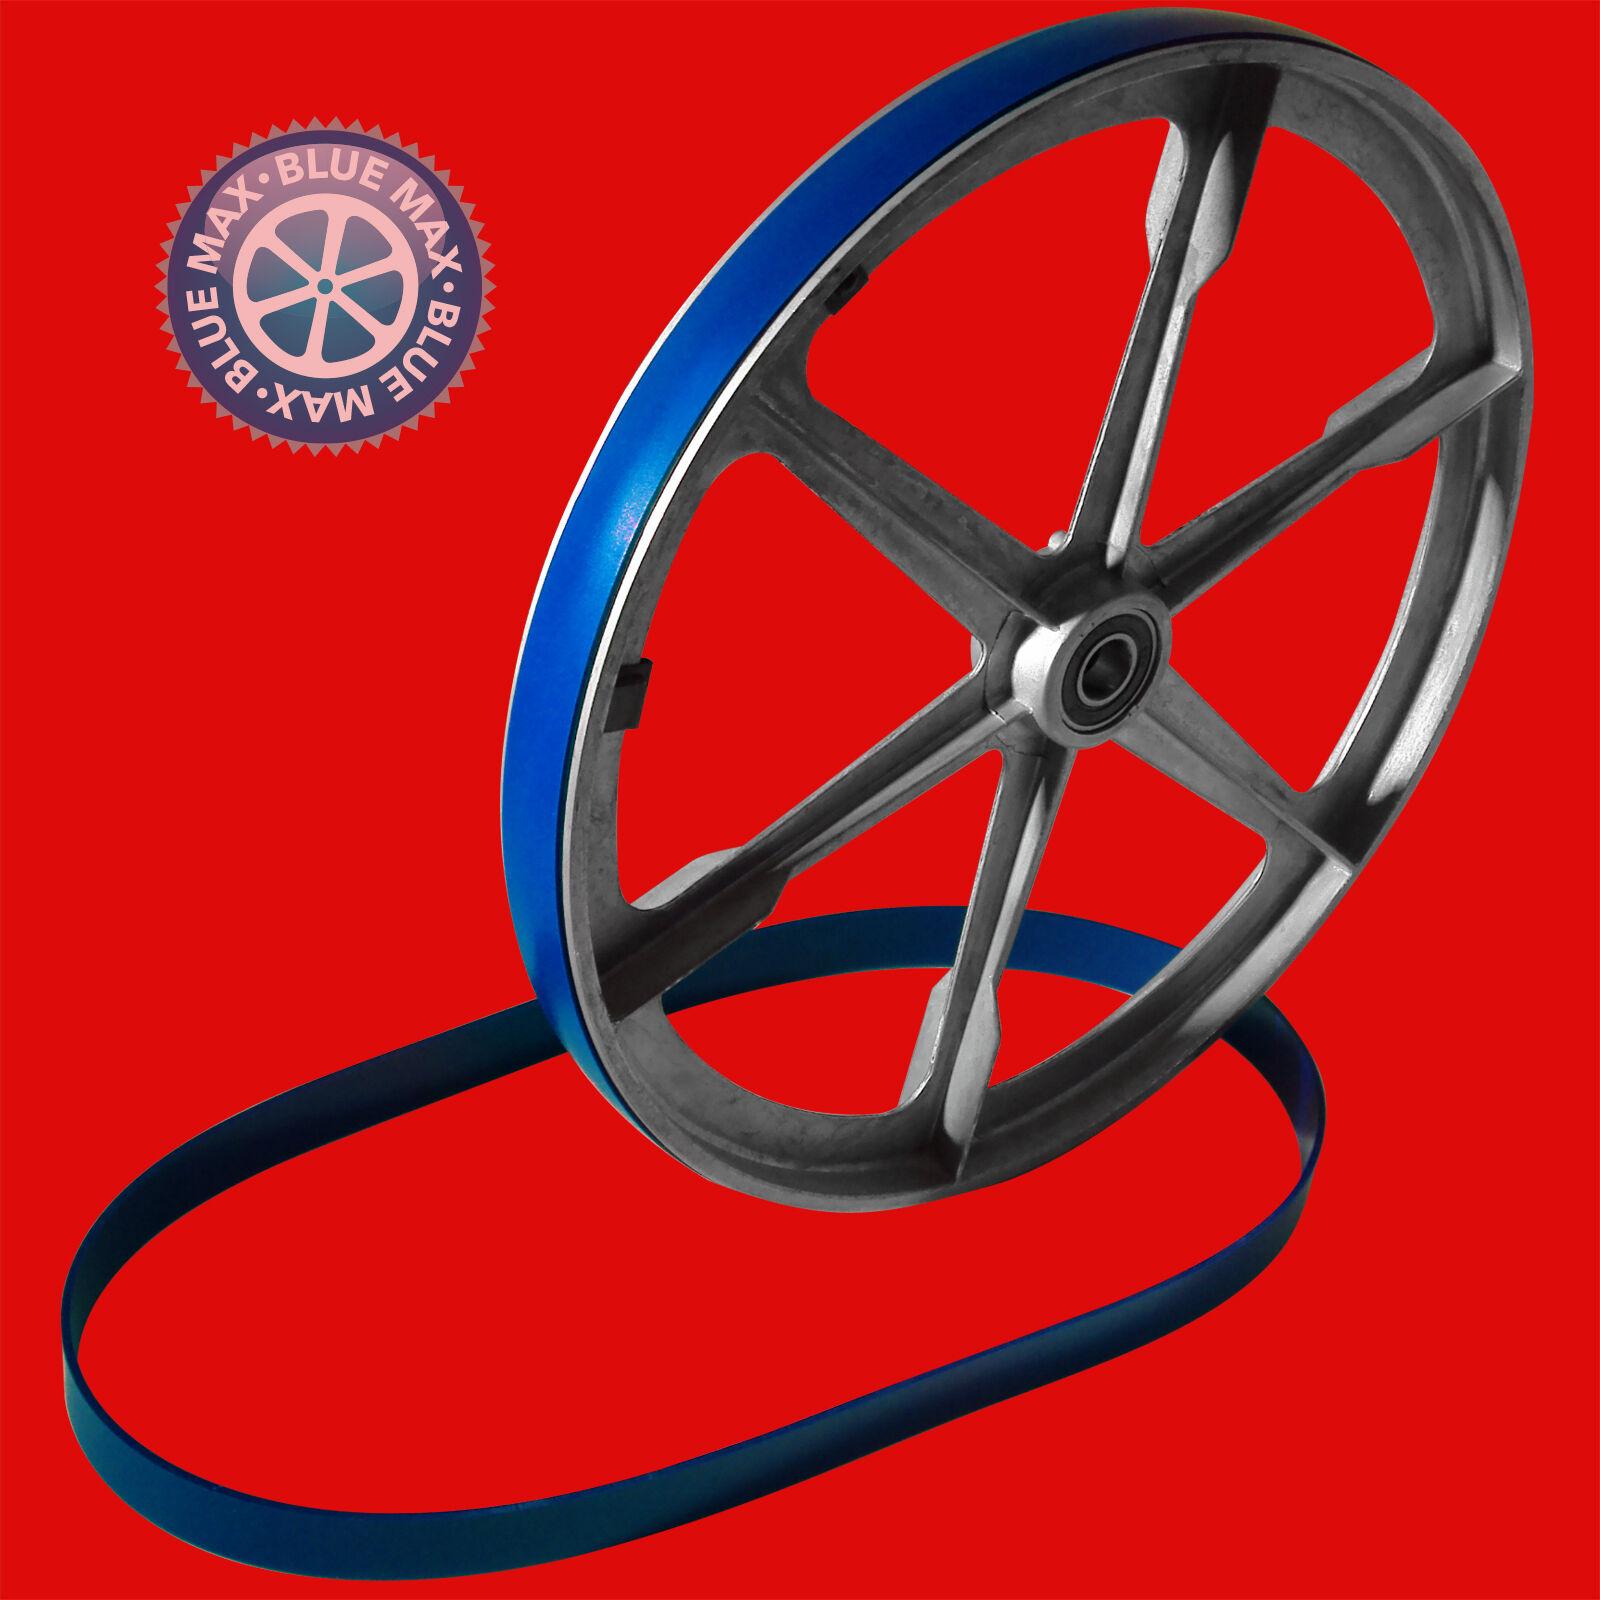 3 Blau Max Ultra Muy Cinta Sierra Neumáticos 14 X 3 4 para Parma Trabajo a Matic